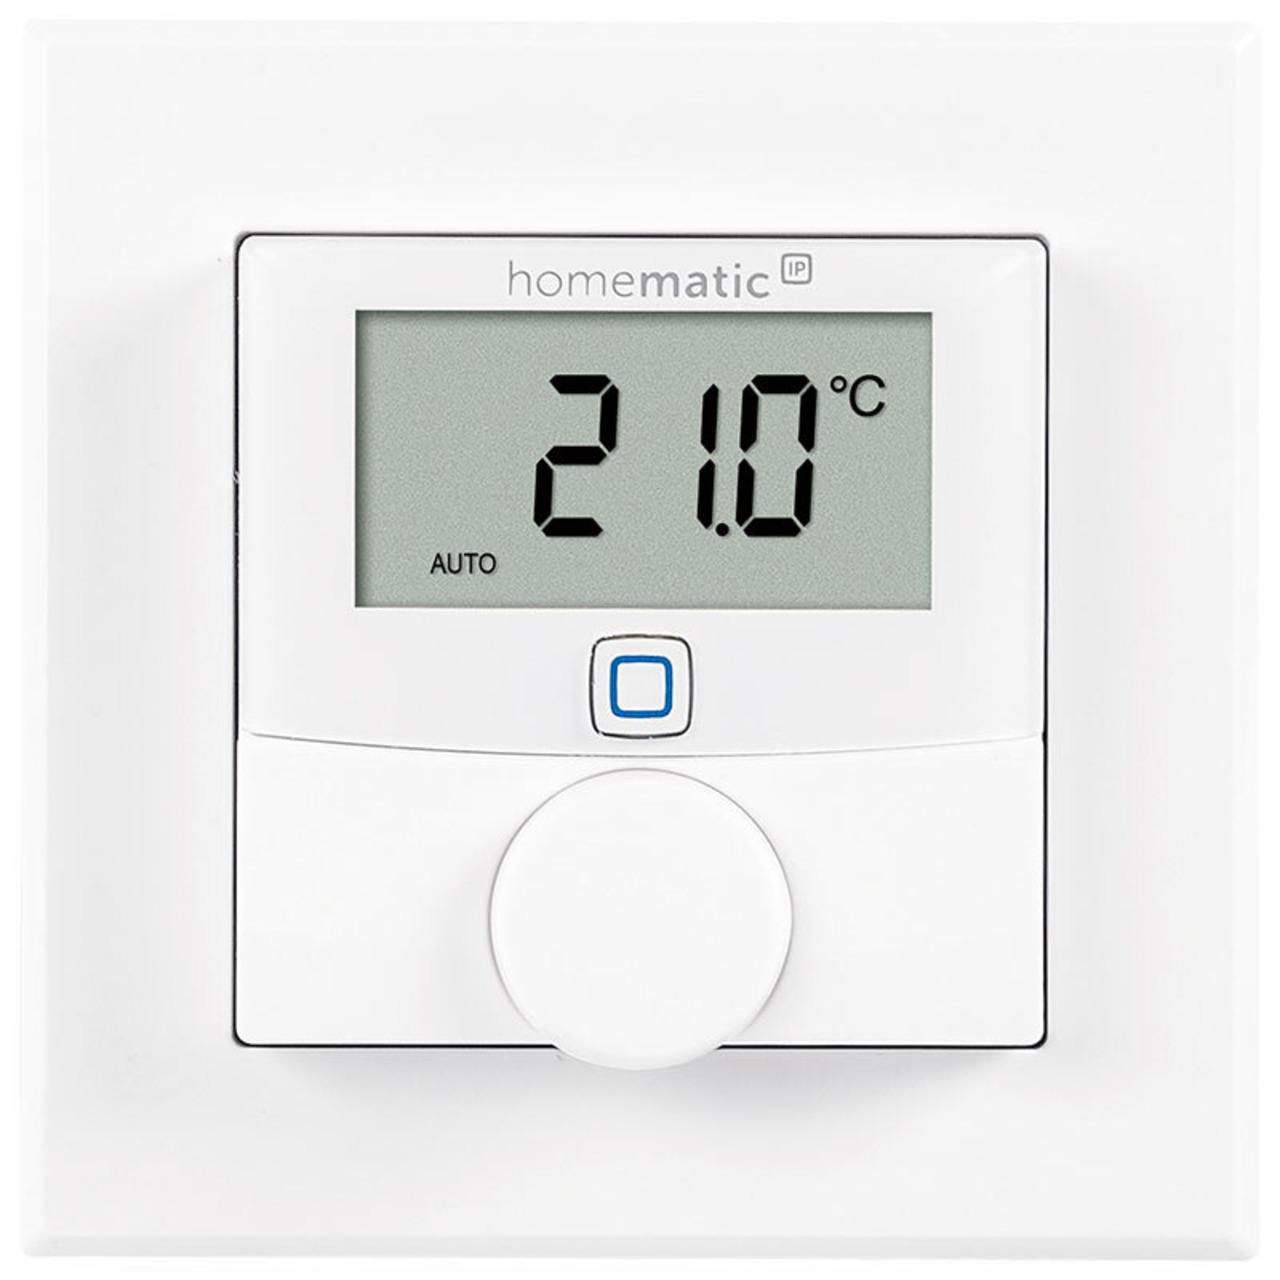 ELV Homematic IP Komplettbausatz Wandthermostat HmIP-WTH-2- für Smart Home - Hausautomation